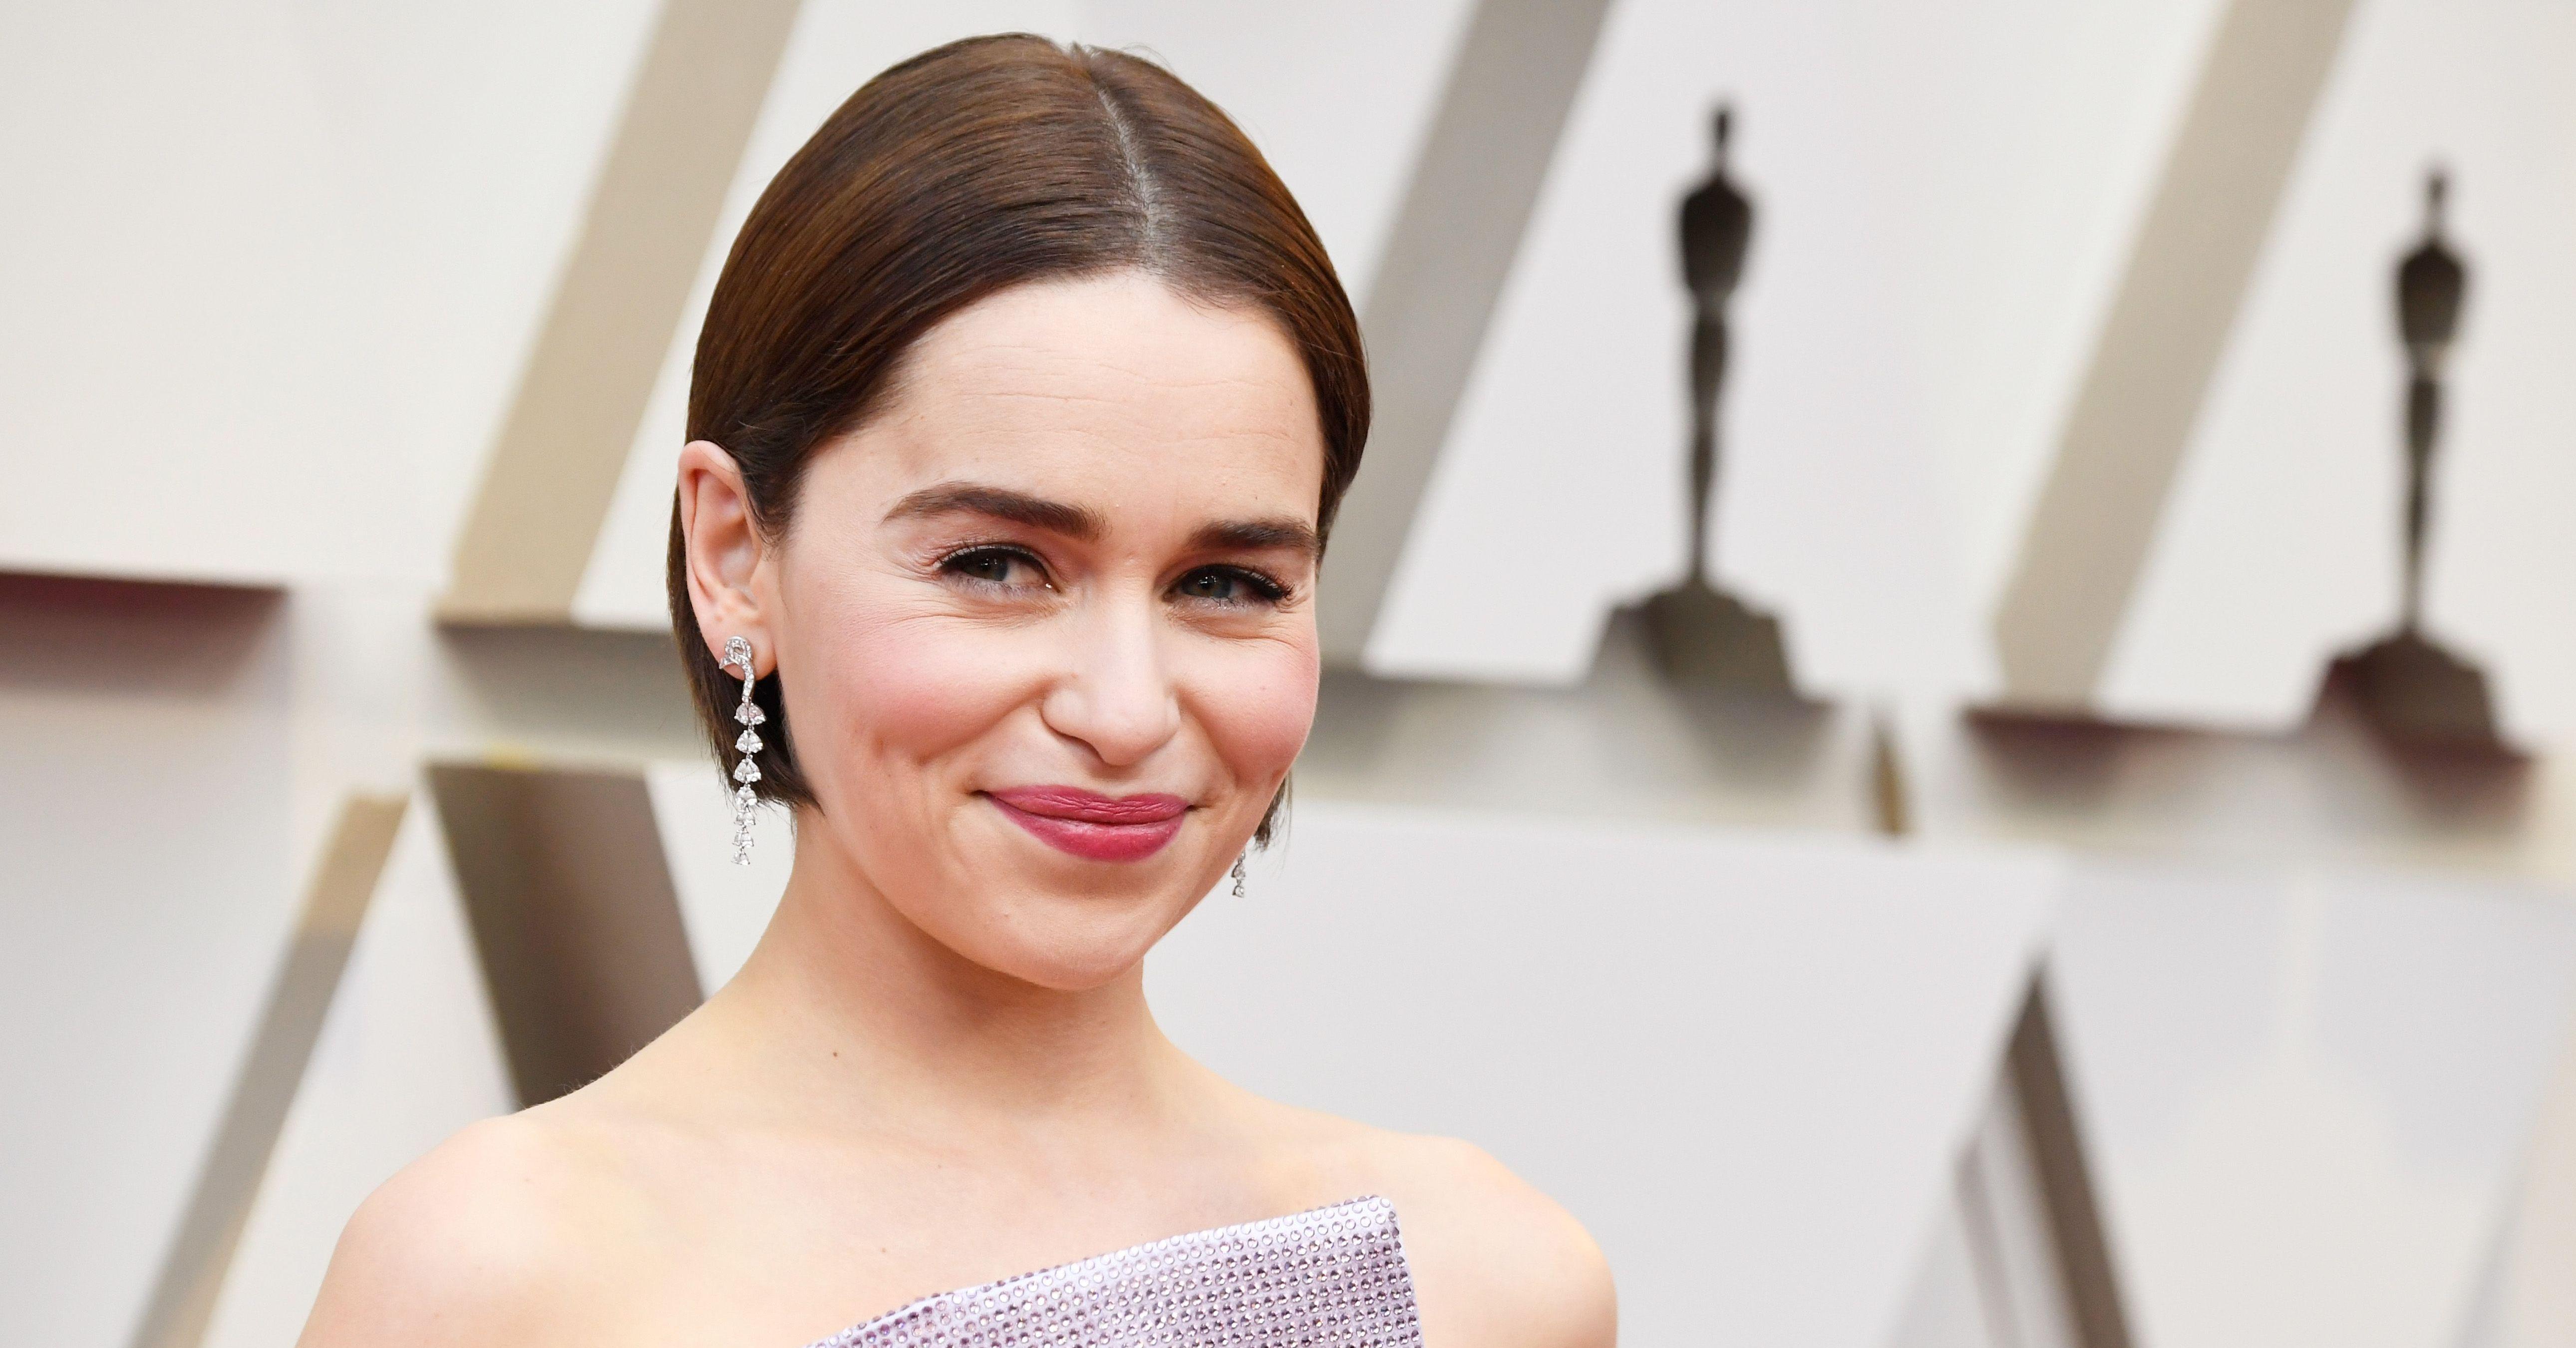 Emilia Clarke felt pressured to do nude scenes in Game of